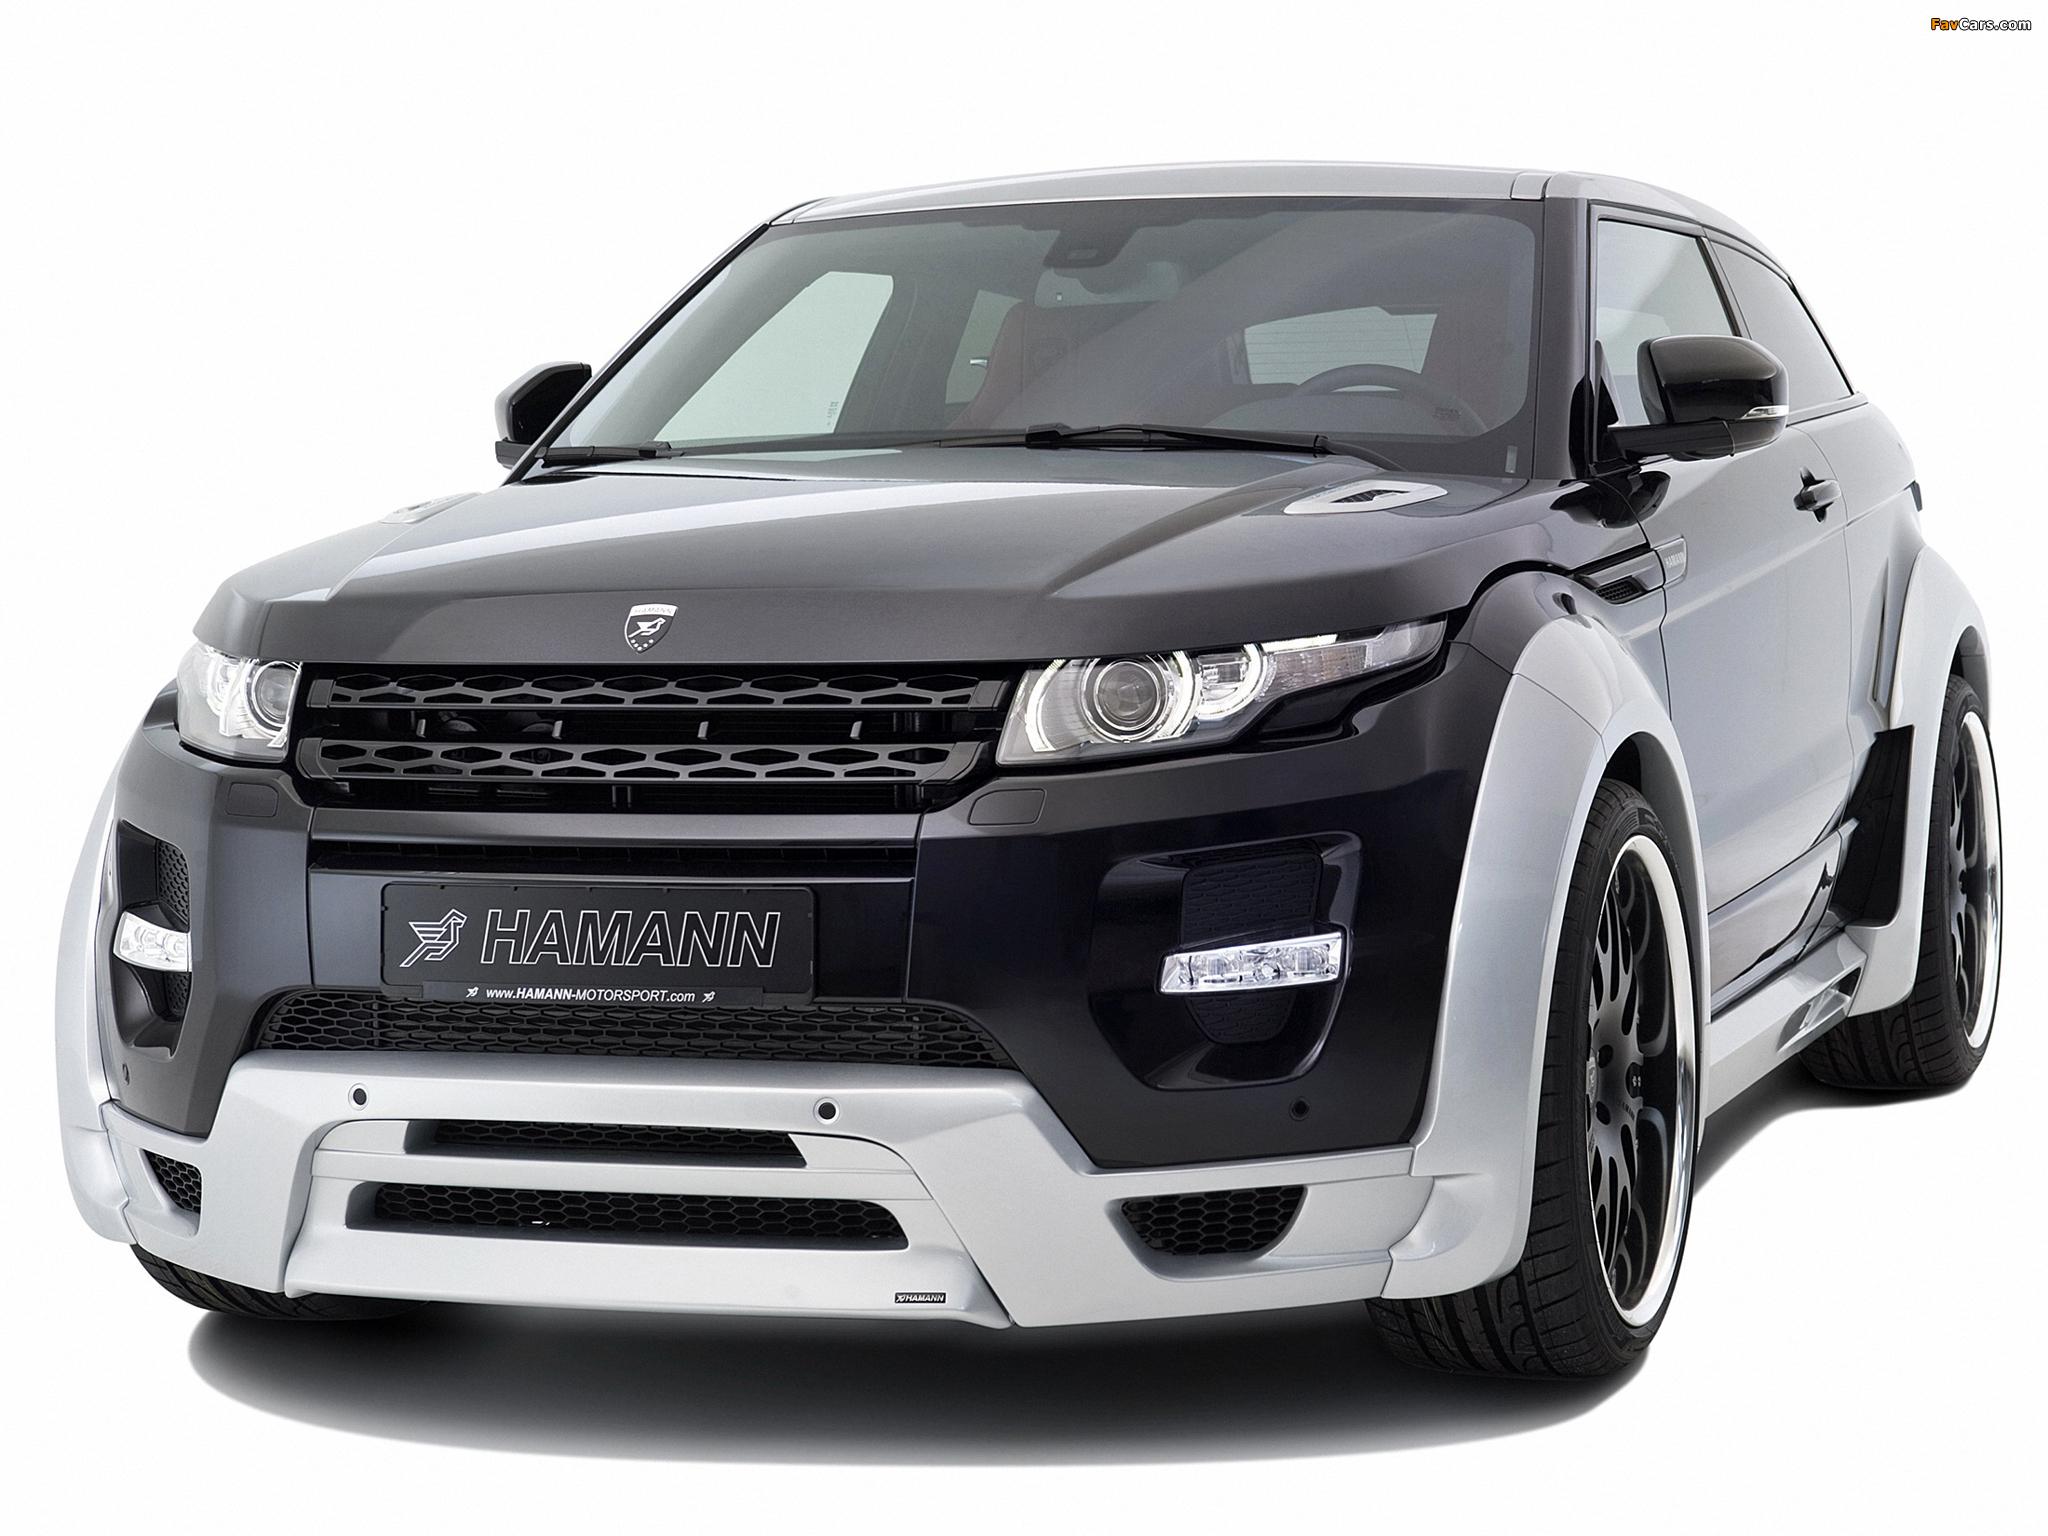 Hamann Range Rover Evoque Coupe 2012 pictures (2048 x 1536)